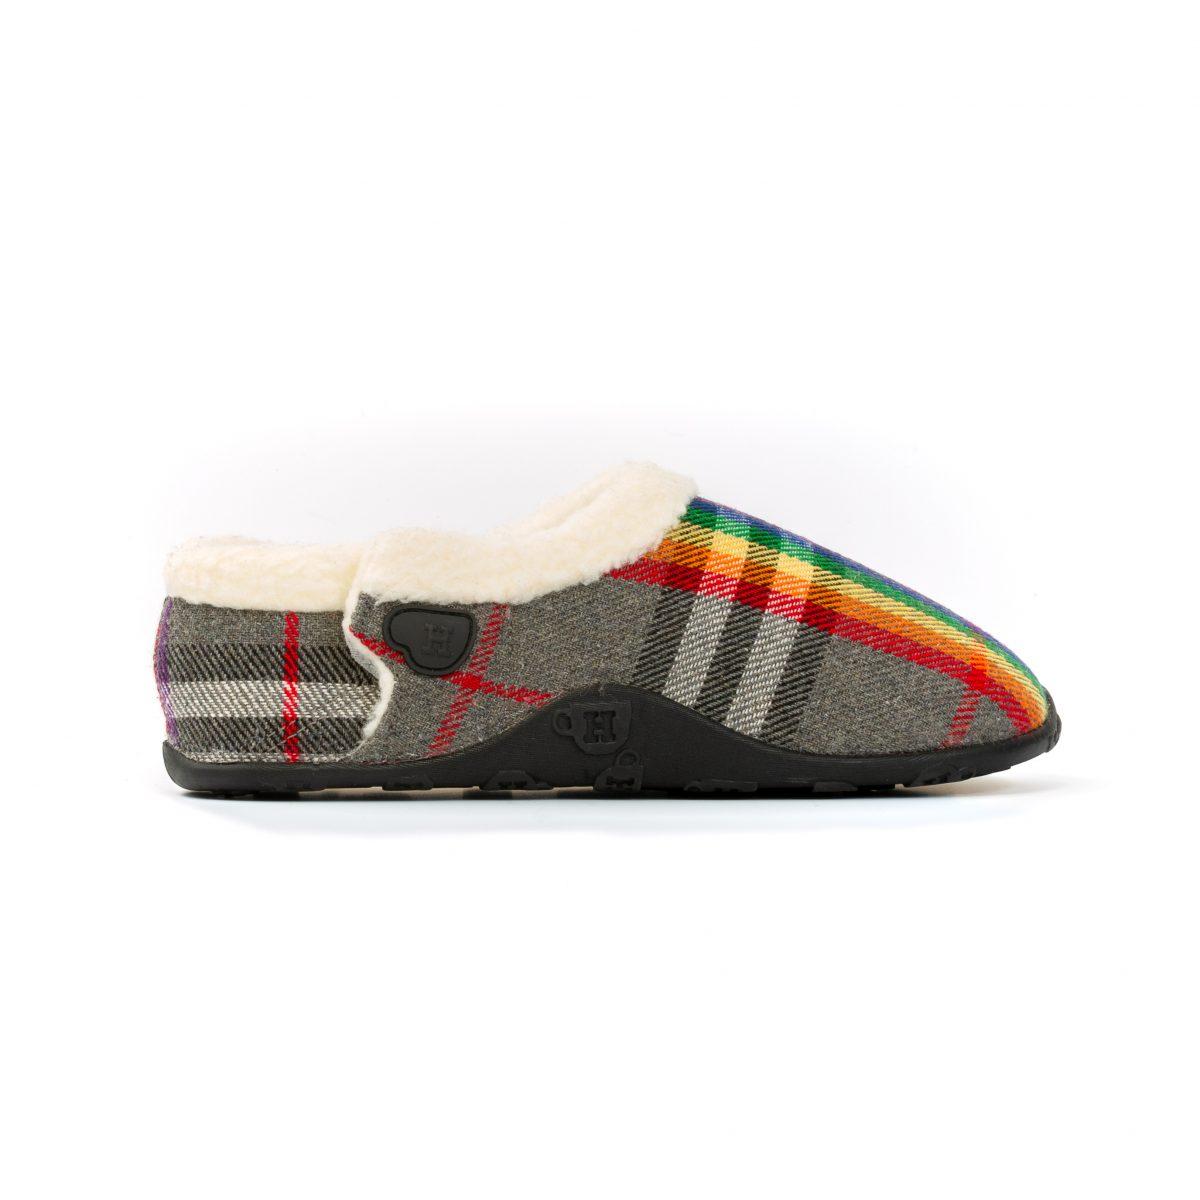 Bella-Rainbow-stripe-and-grey-check-04.jpg